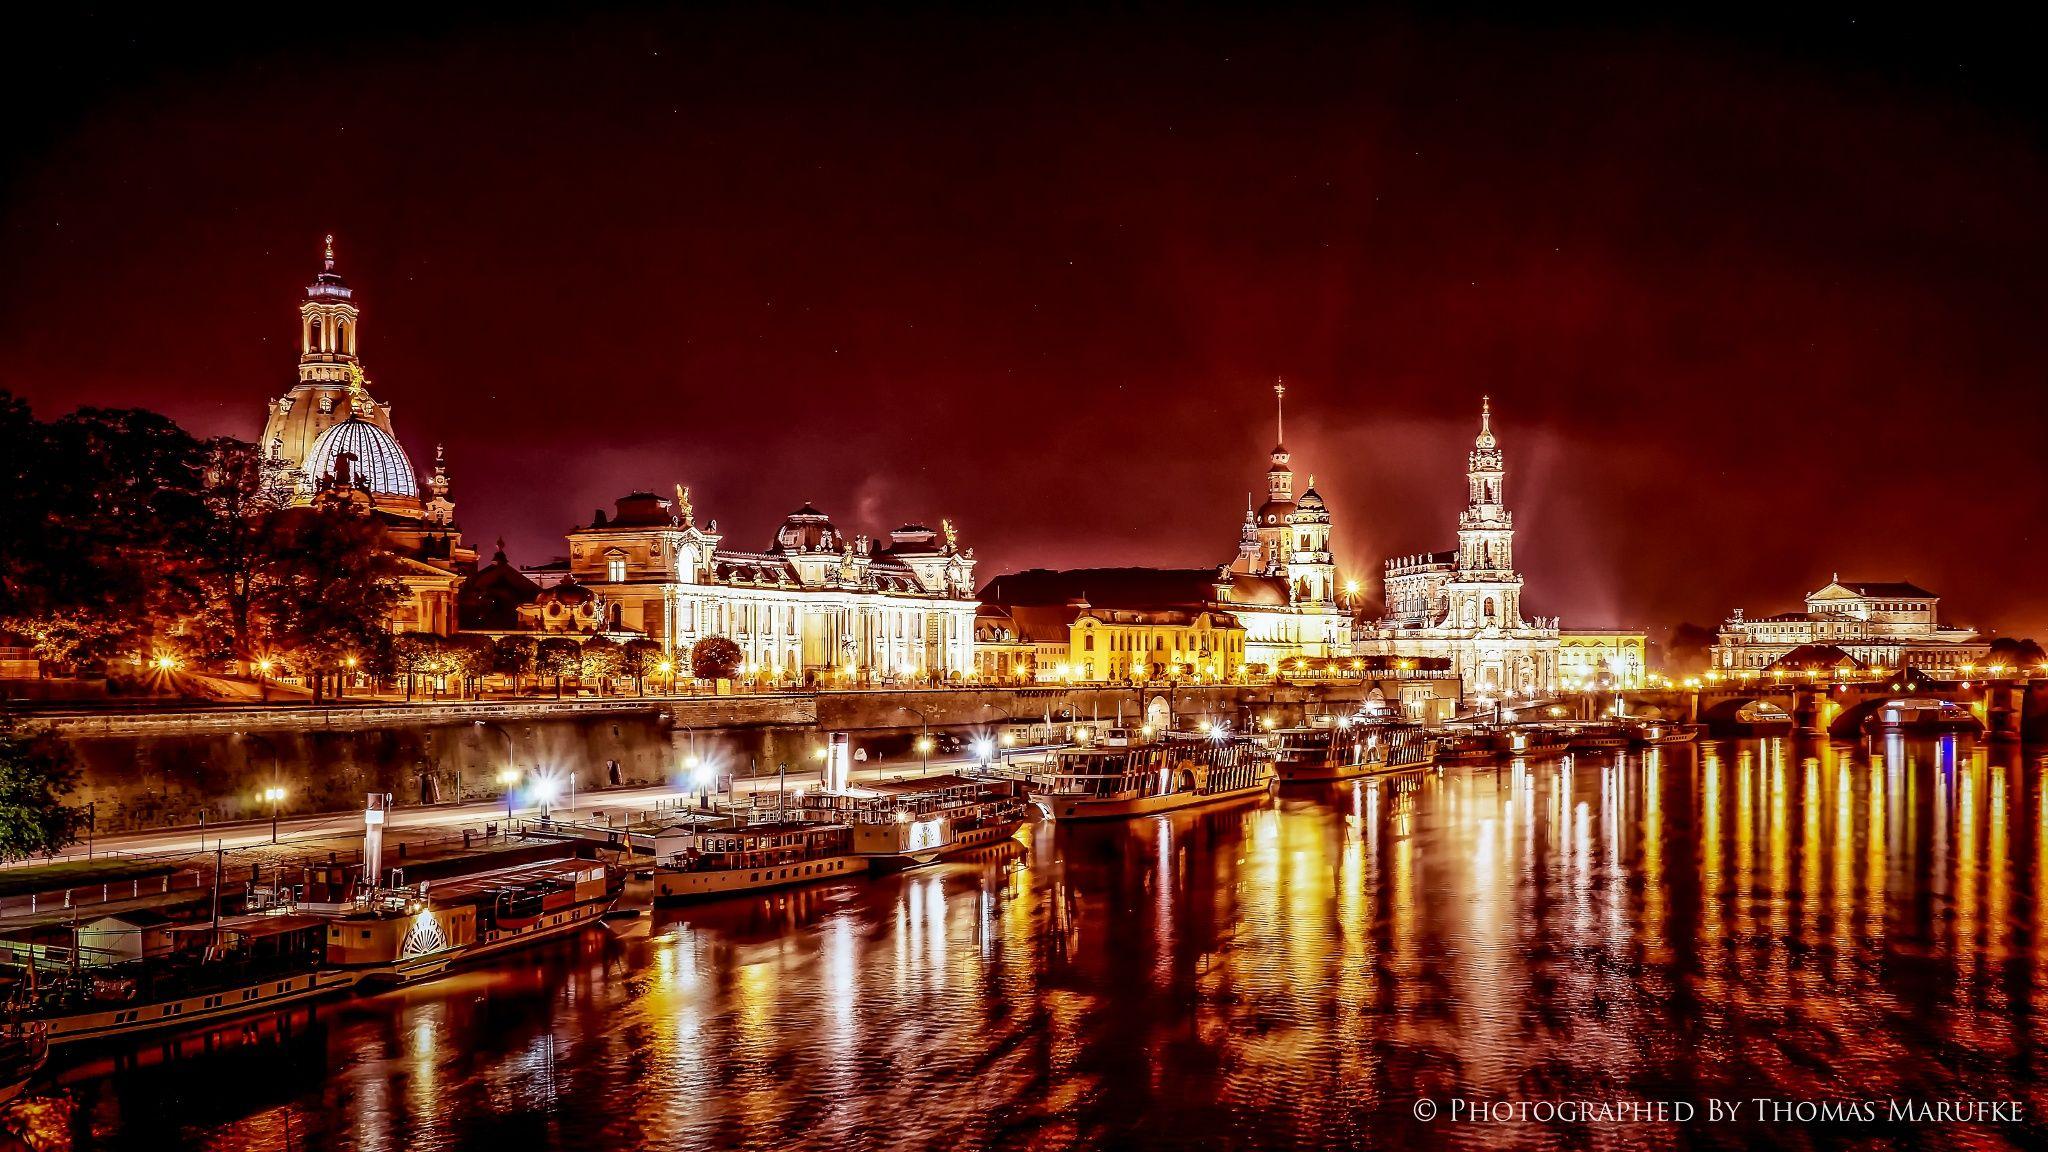 Schön Skyline Dresden Beste Wahl At Night I By Thomas Marufke On